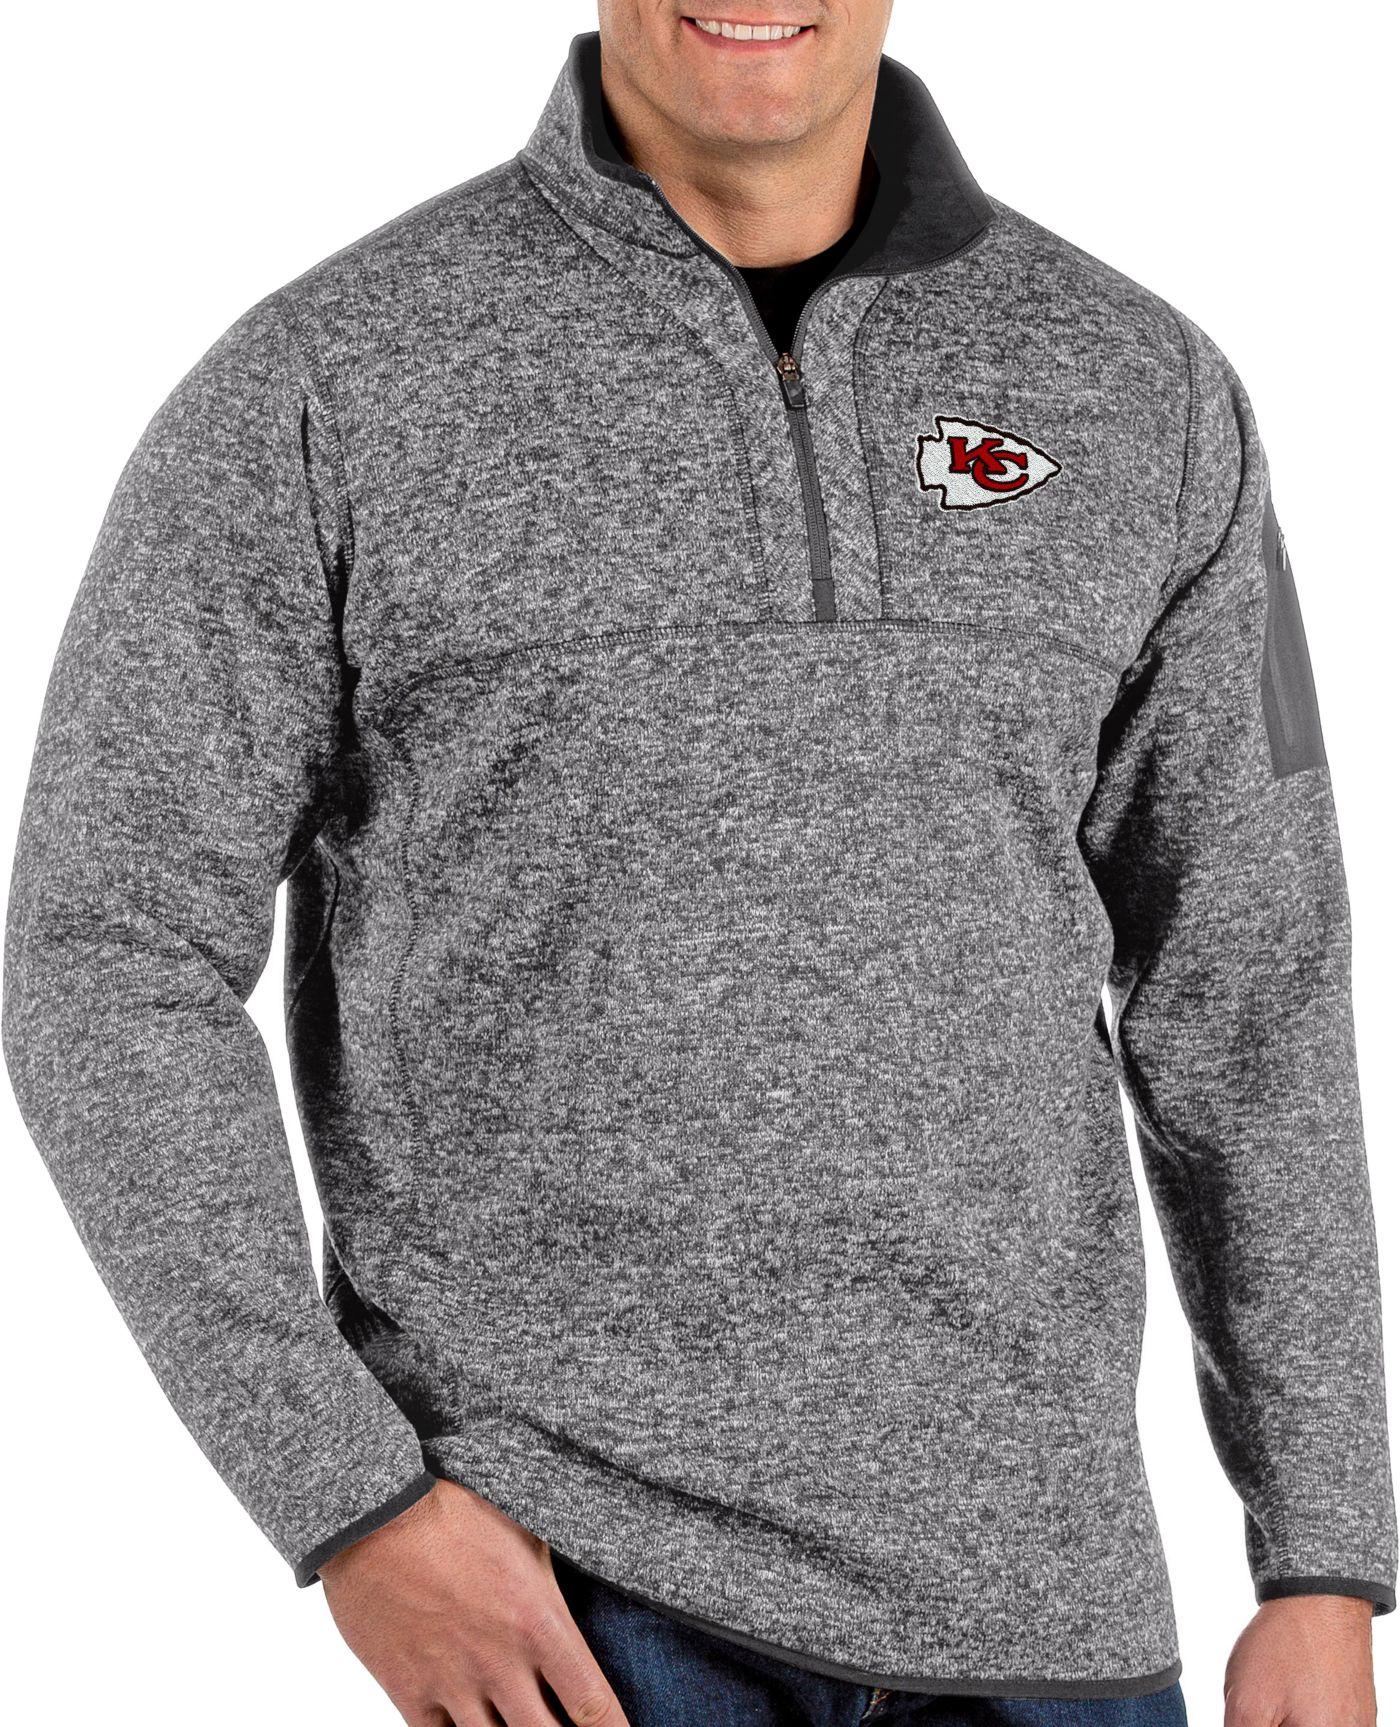 Antigua Men's Kansas City Chiefs Fortune Grey Quarter-Zip Pullover